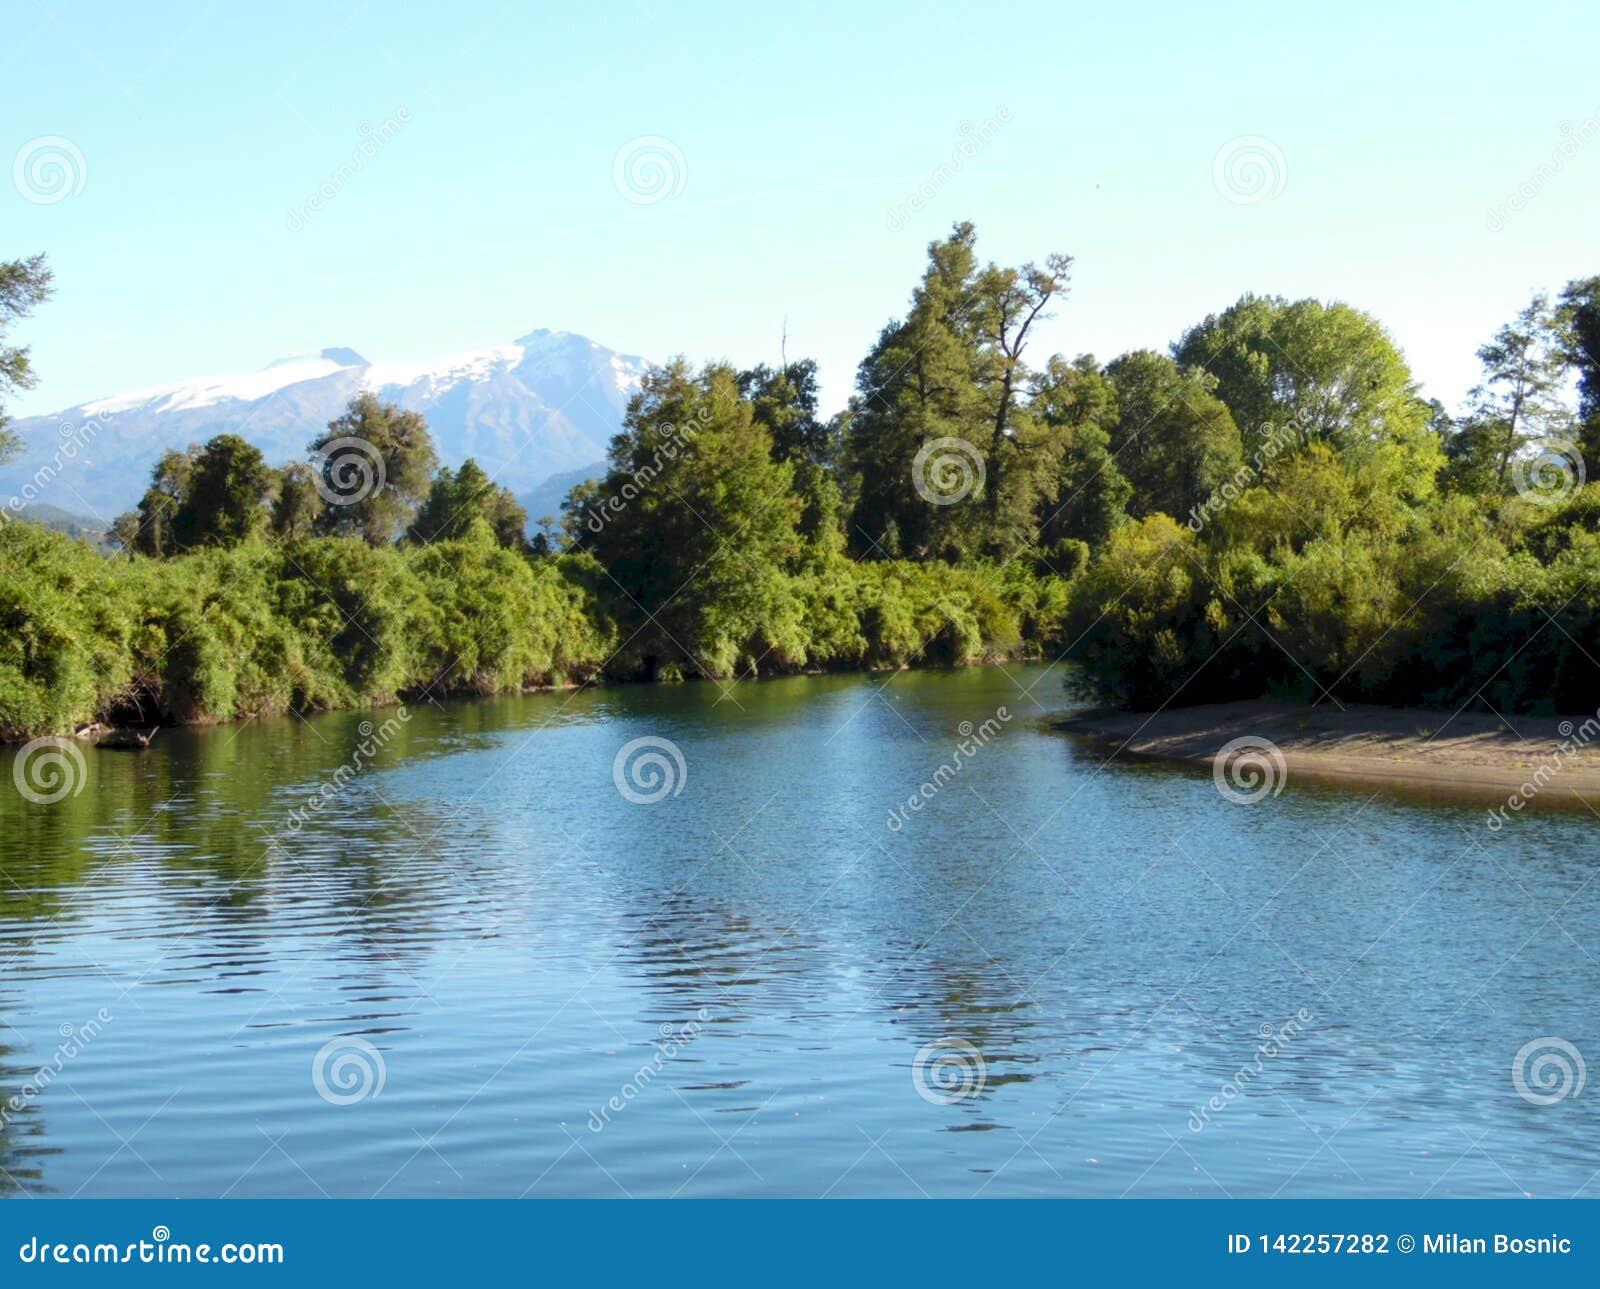 Cua Cua river in the south of Chile